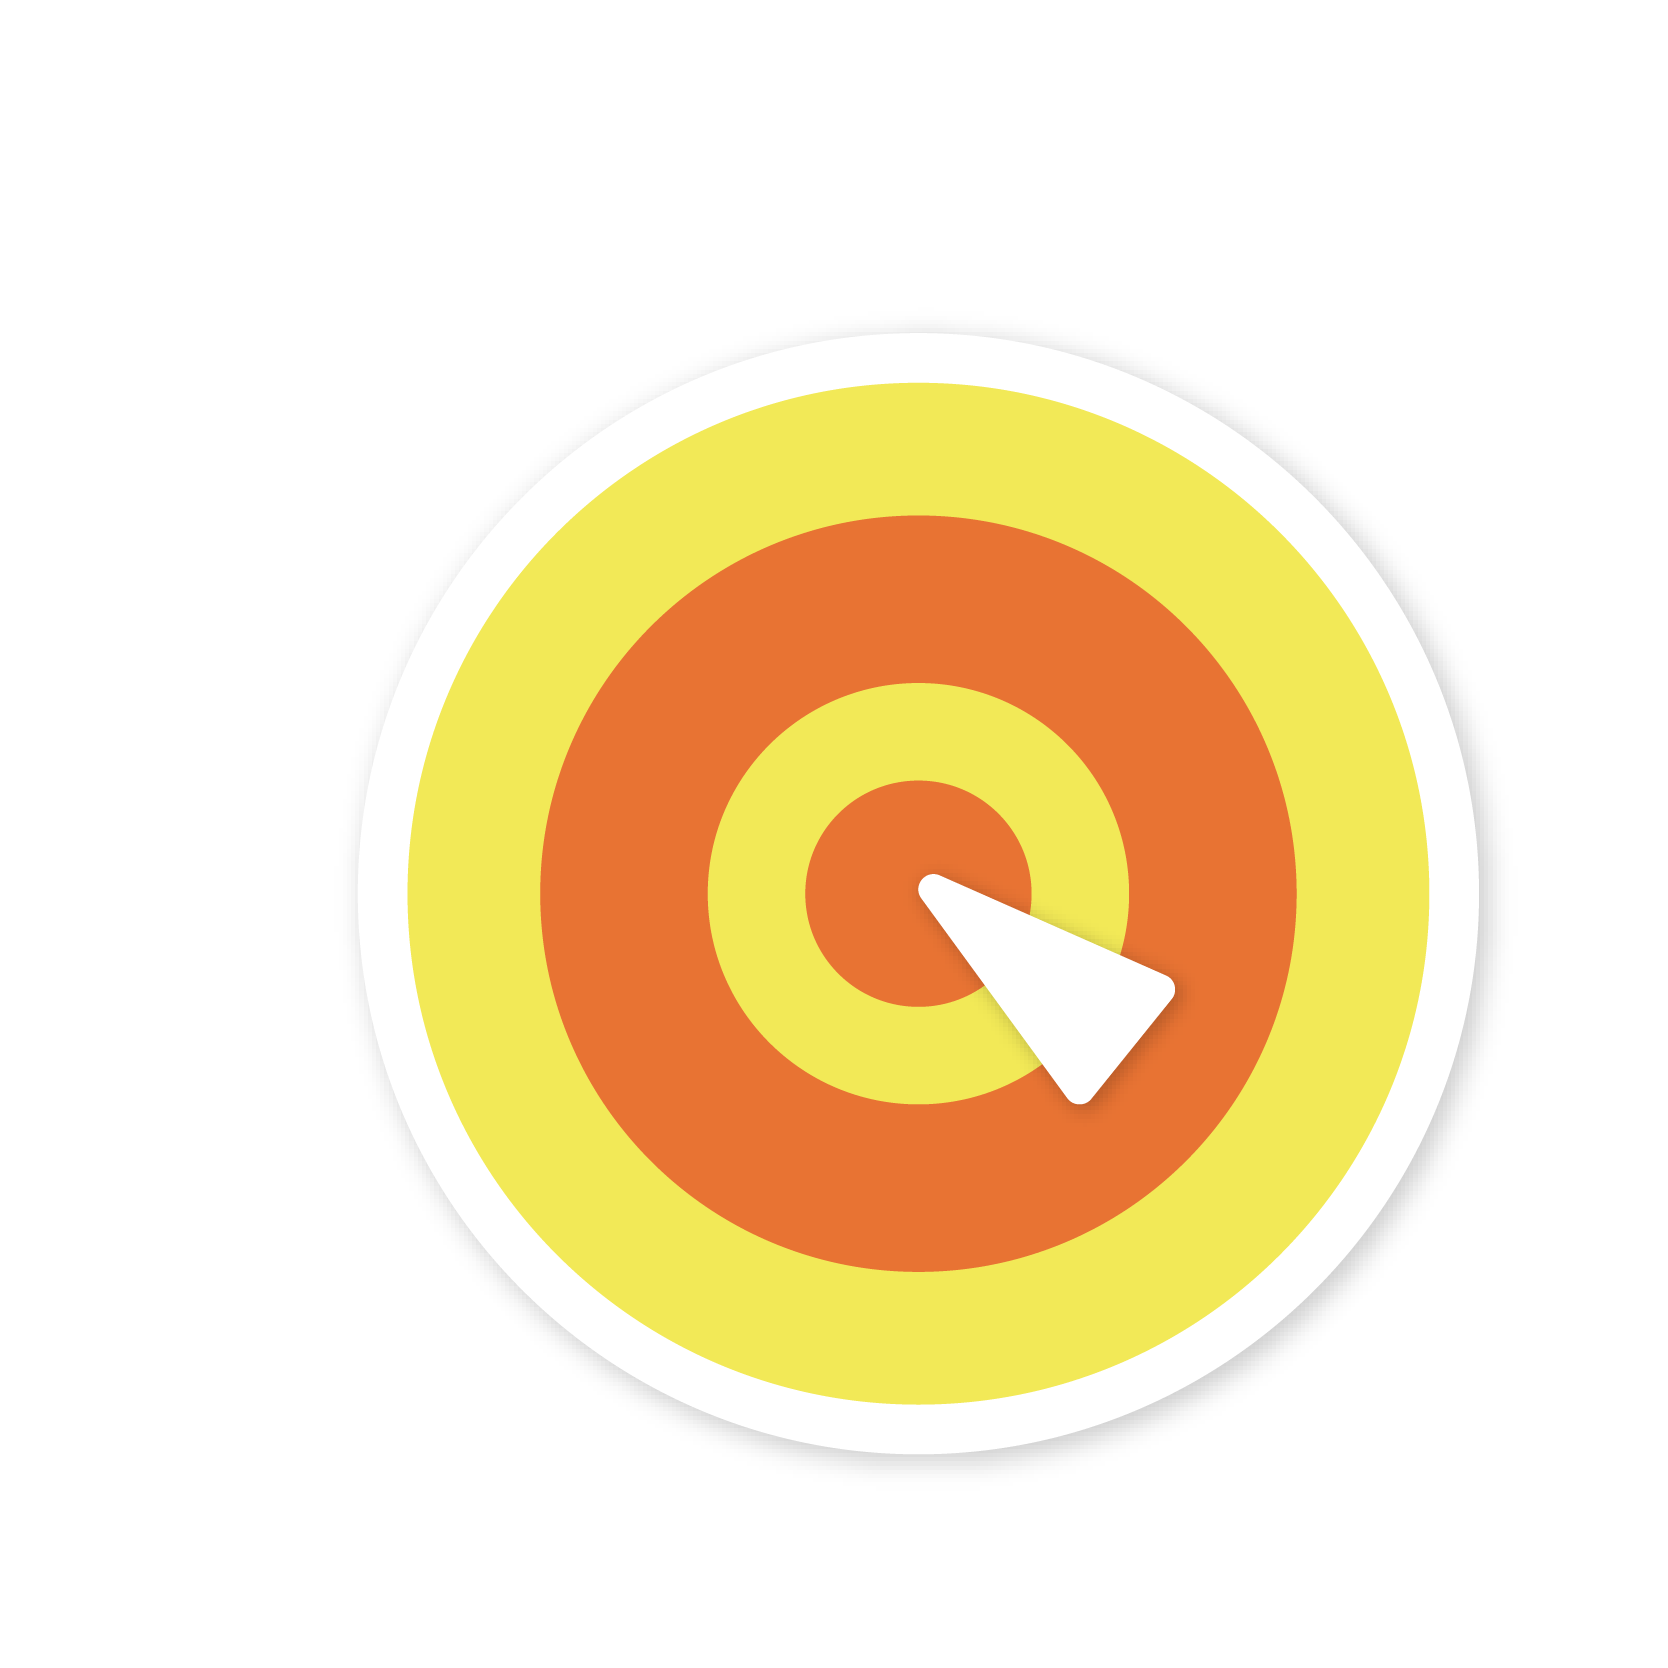 A yellow bull's eye target sticker